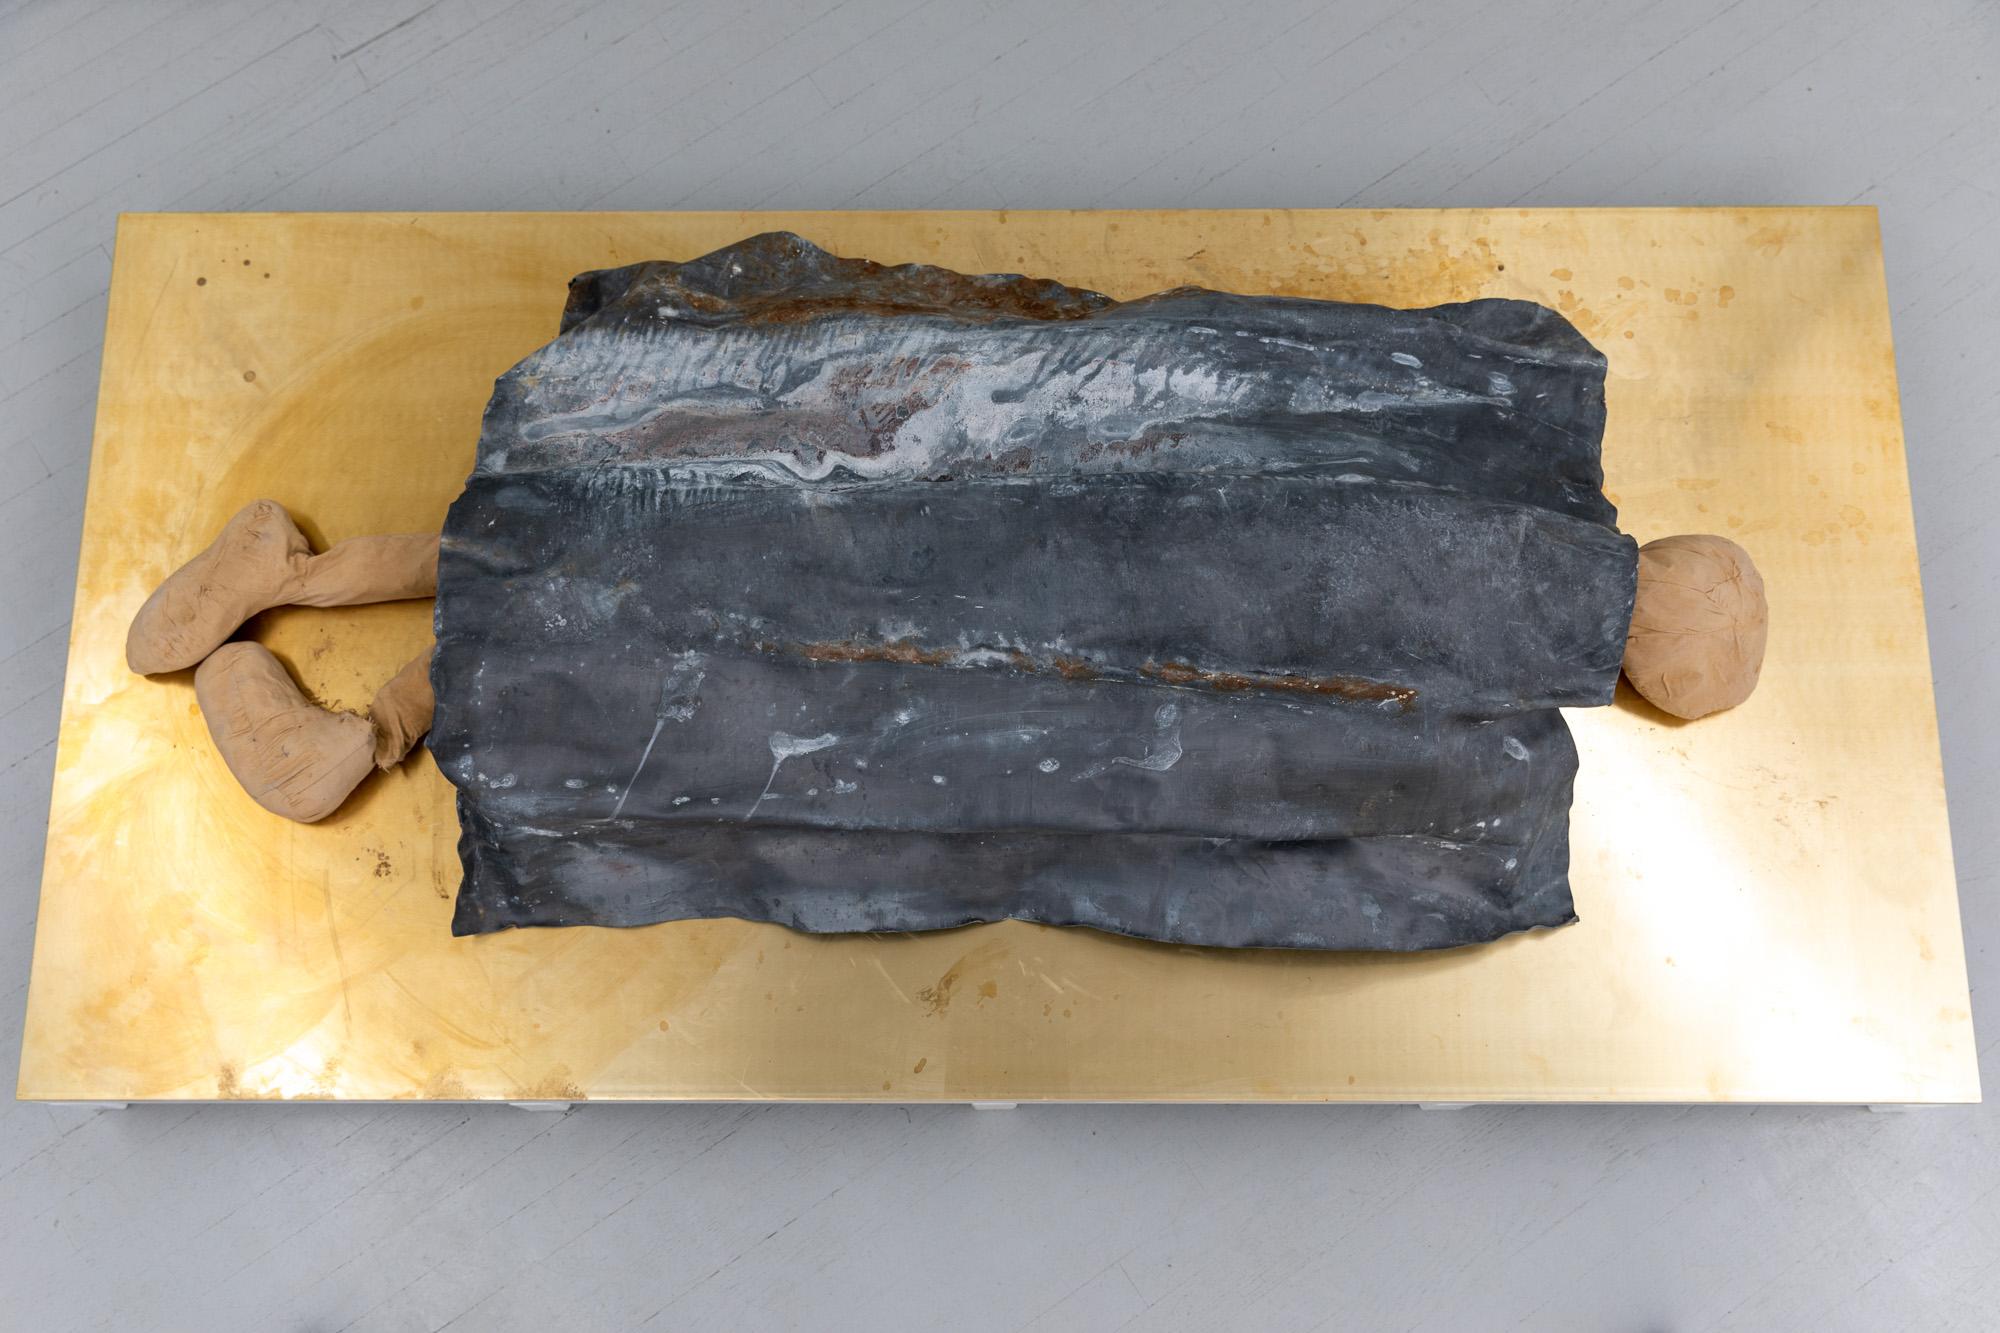 Palett Lead Sheet, 2020. Mixed media (lead, textile, clay, brass, powder-coated steel, plywood) on artist designed pedestal, 41 x 200 x 100 cm